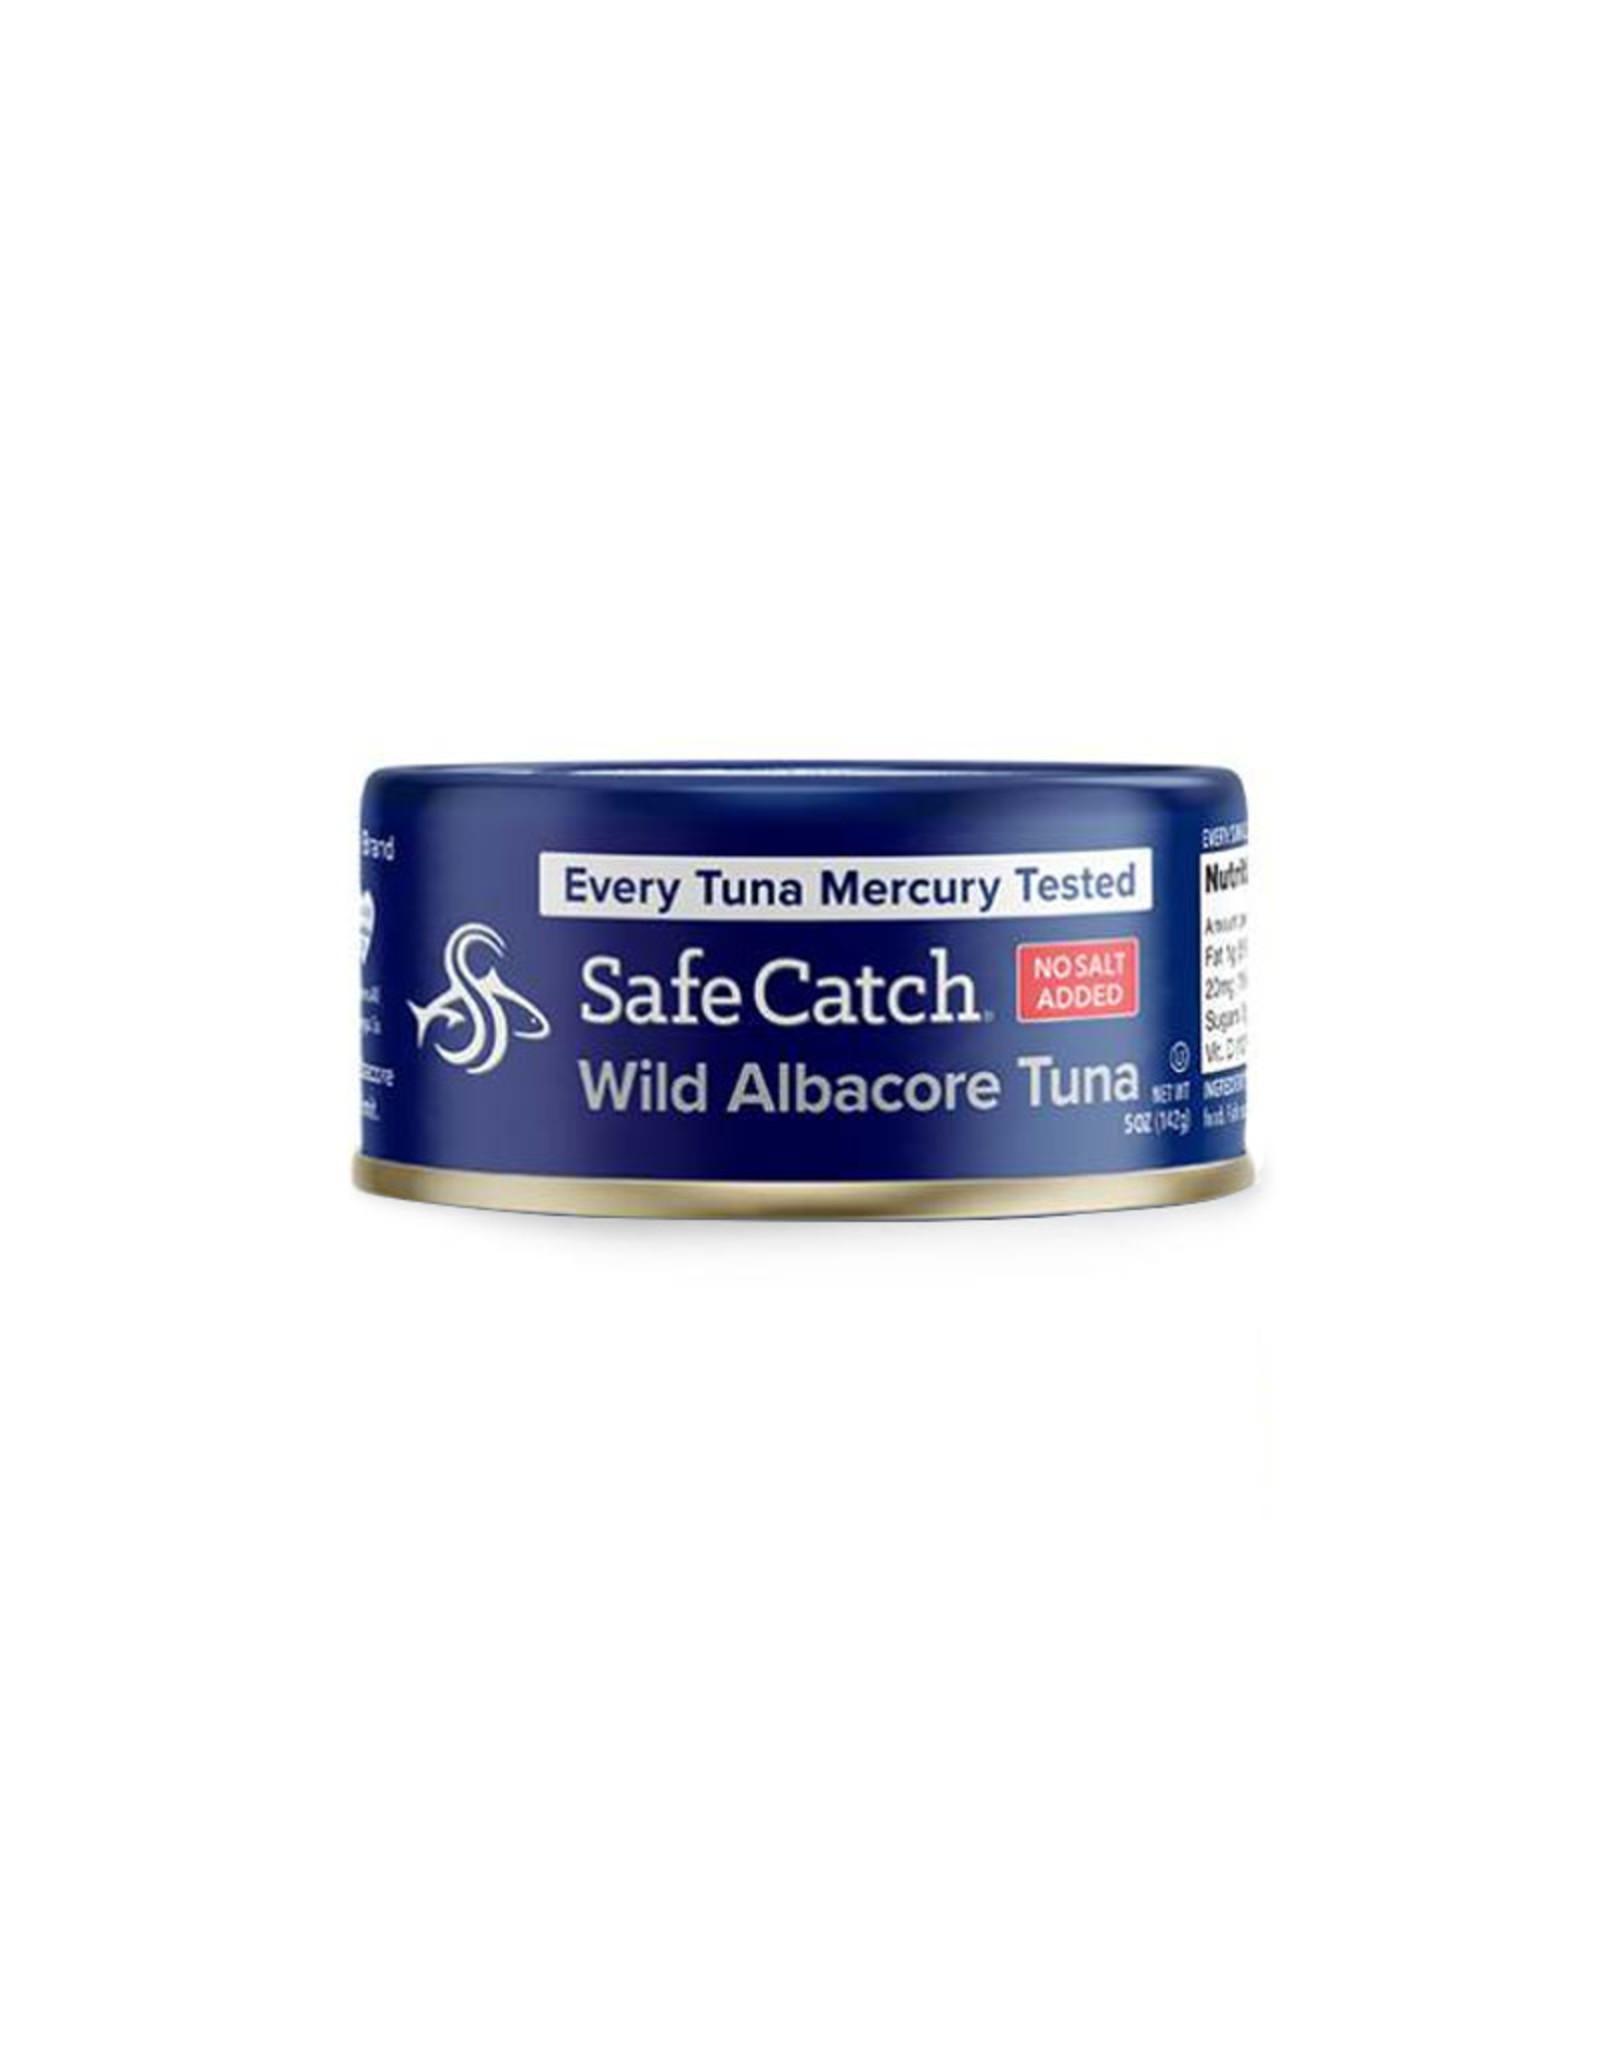 Safe Catch Safe Catch - Wild Albacore Tuna, No Salt (142g)